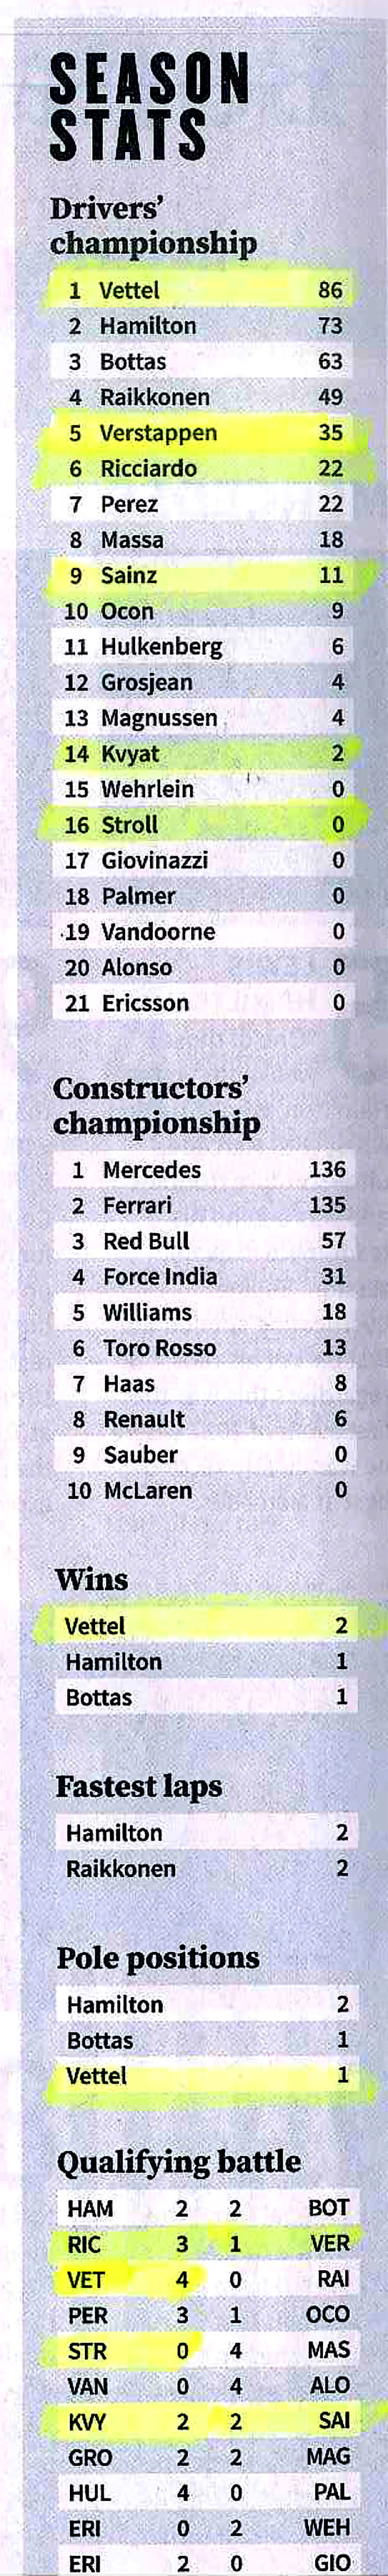 Season Stats for Formula 1